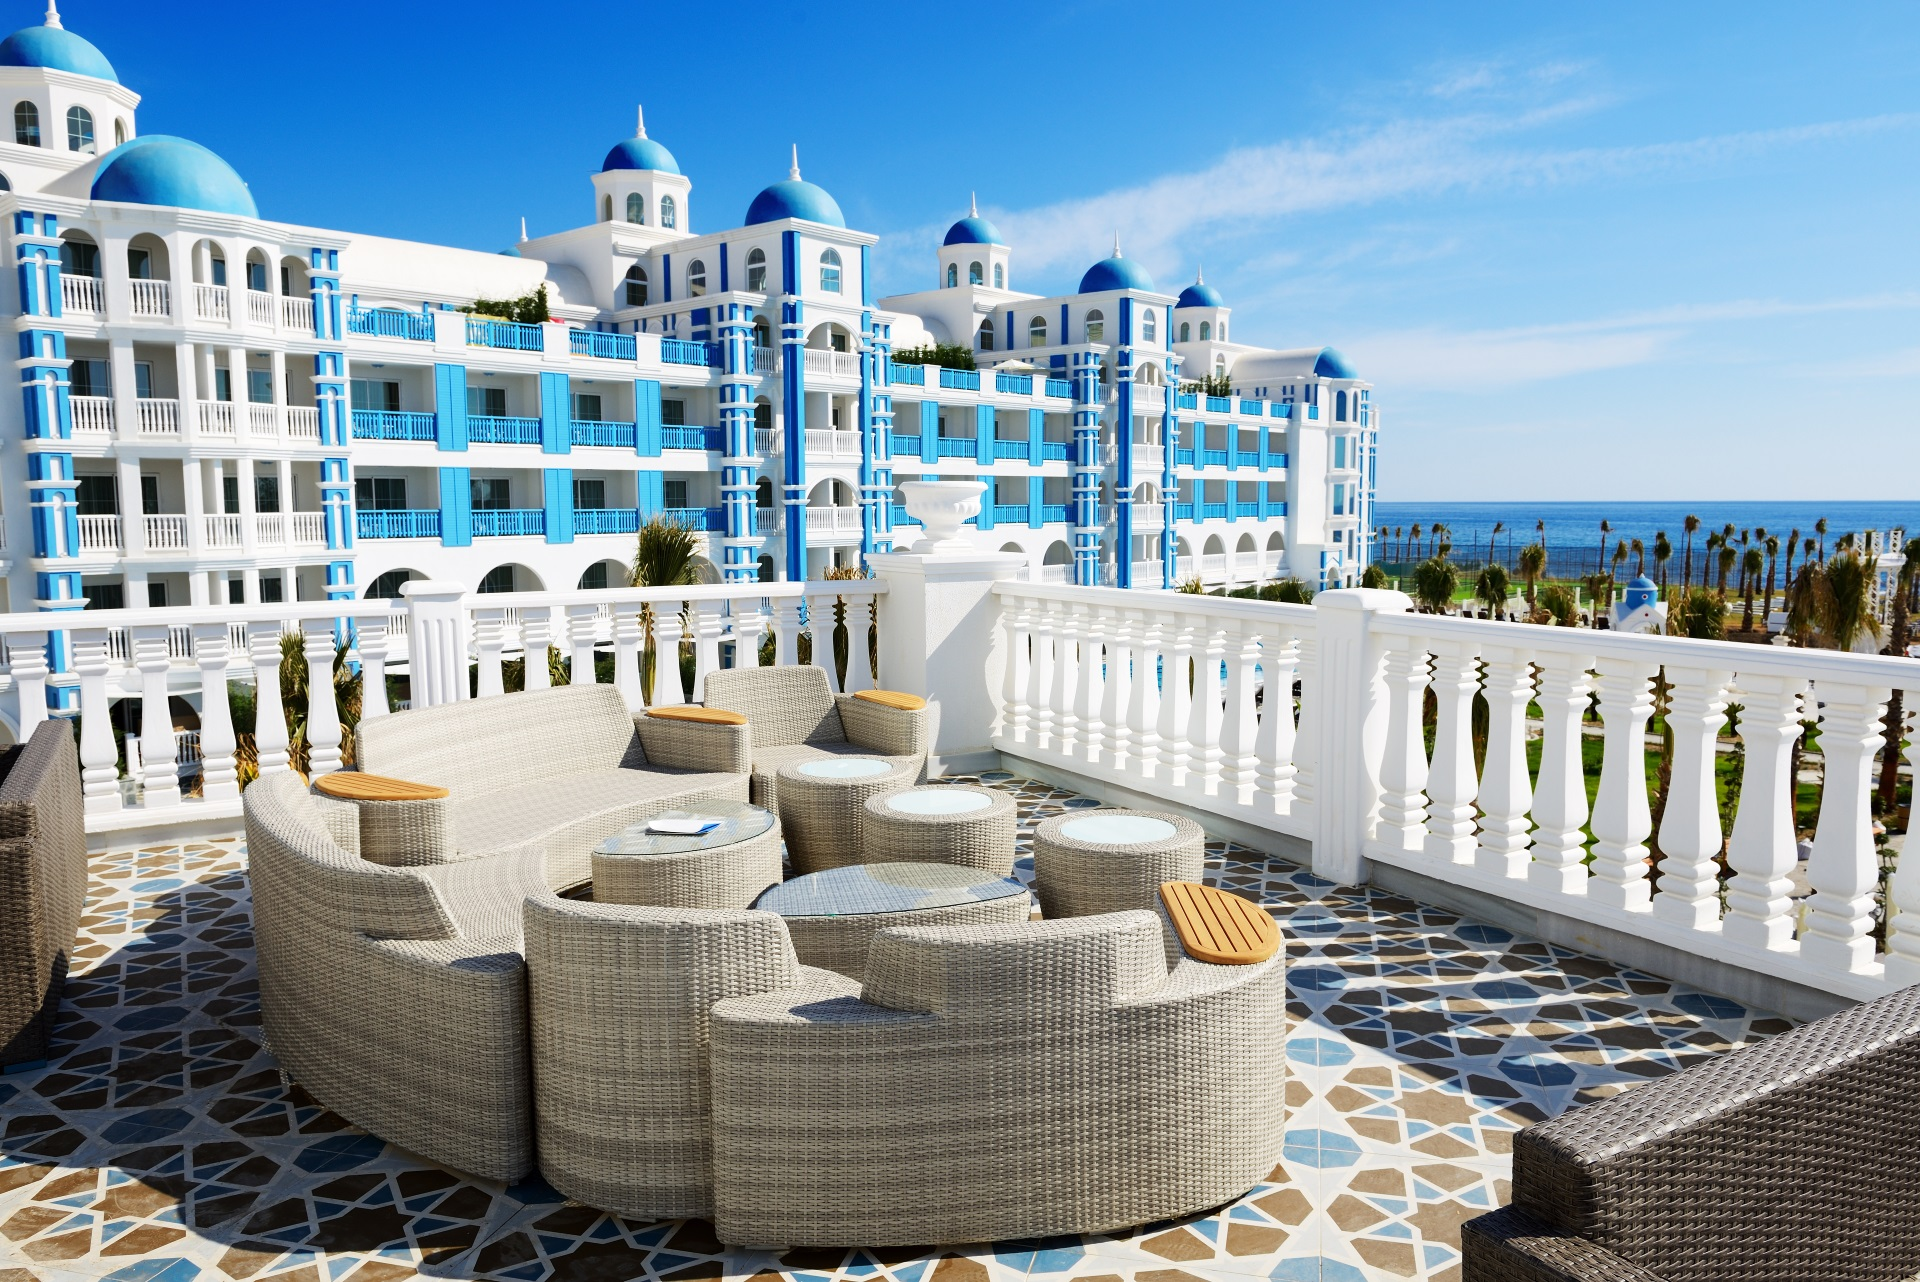 Antalya Türkei Hotel Luxusurlaub